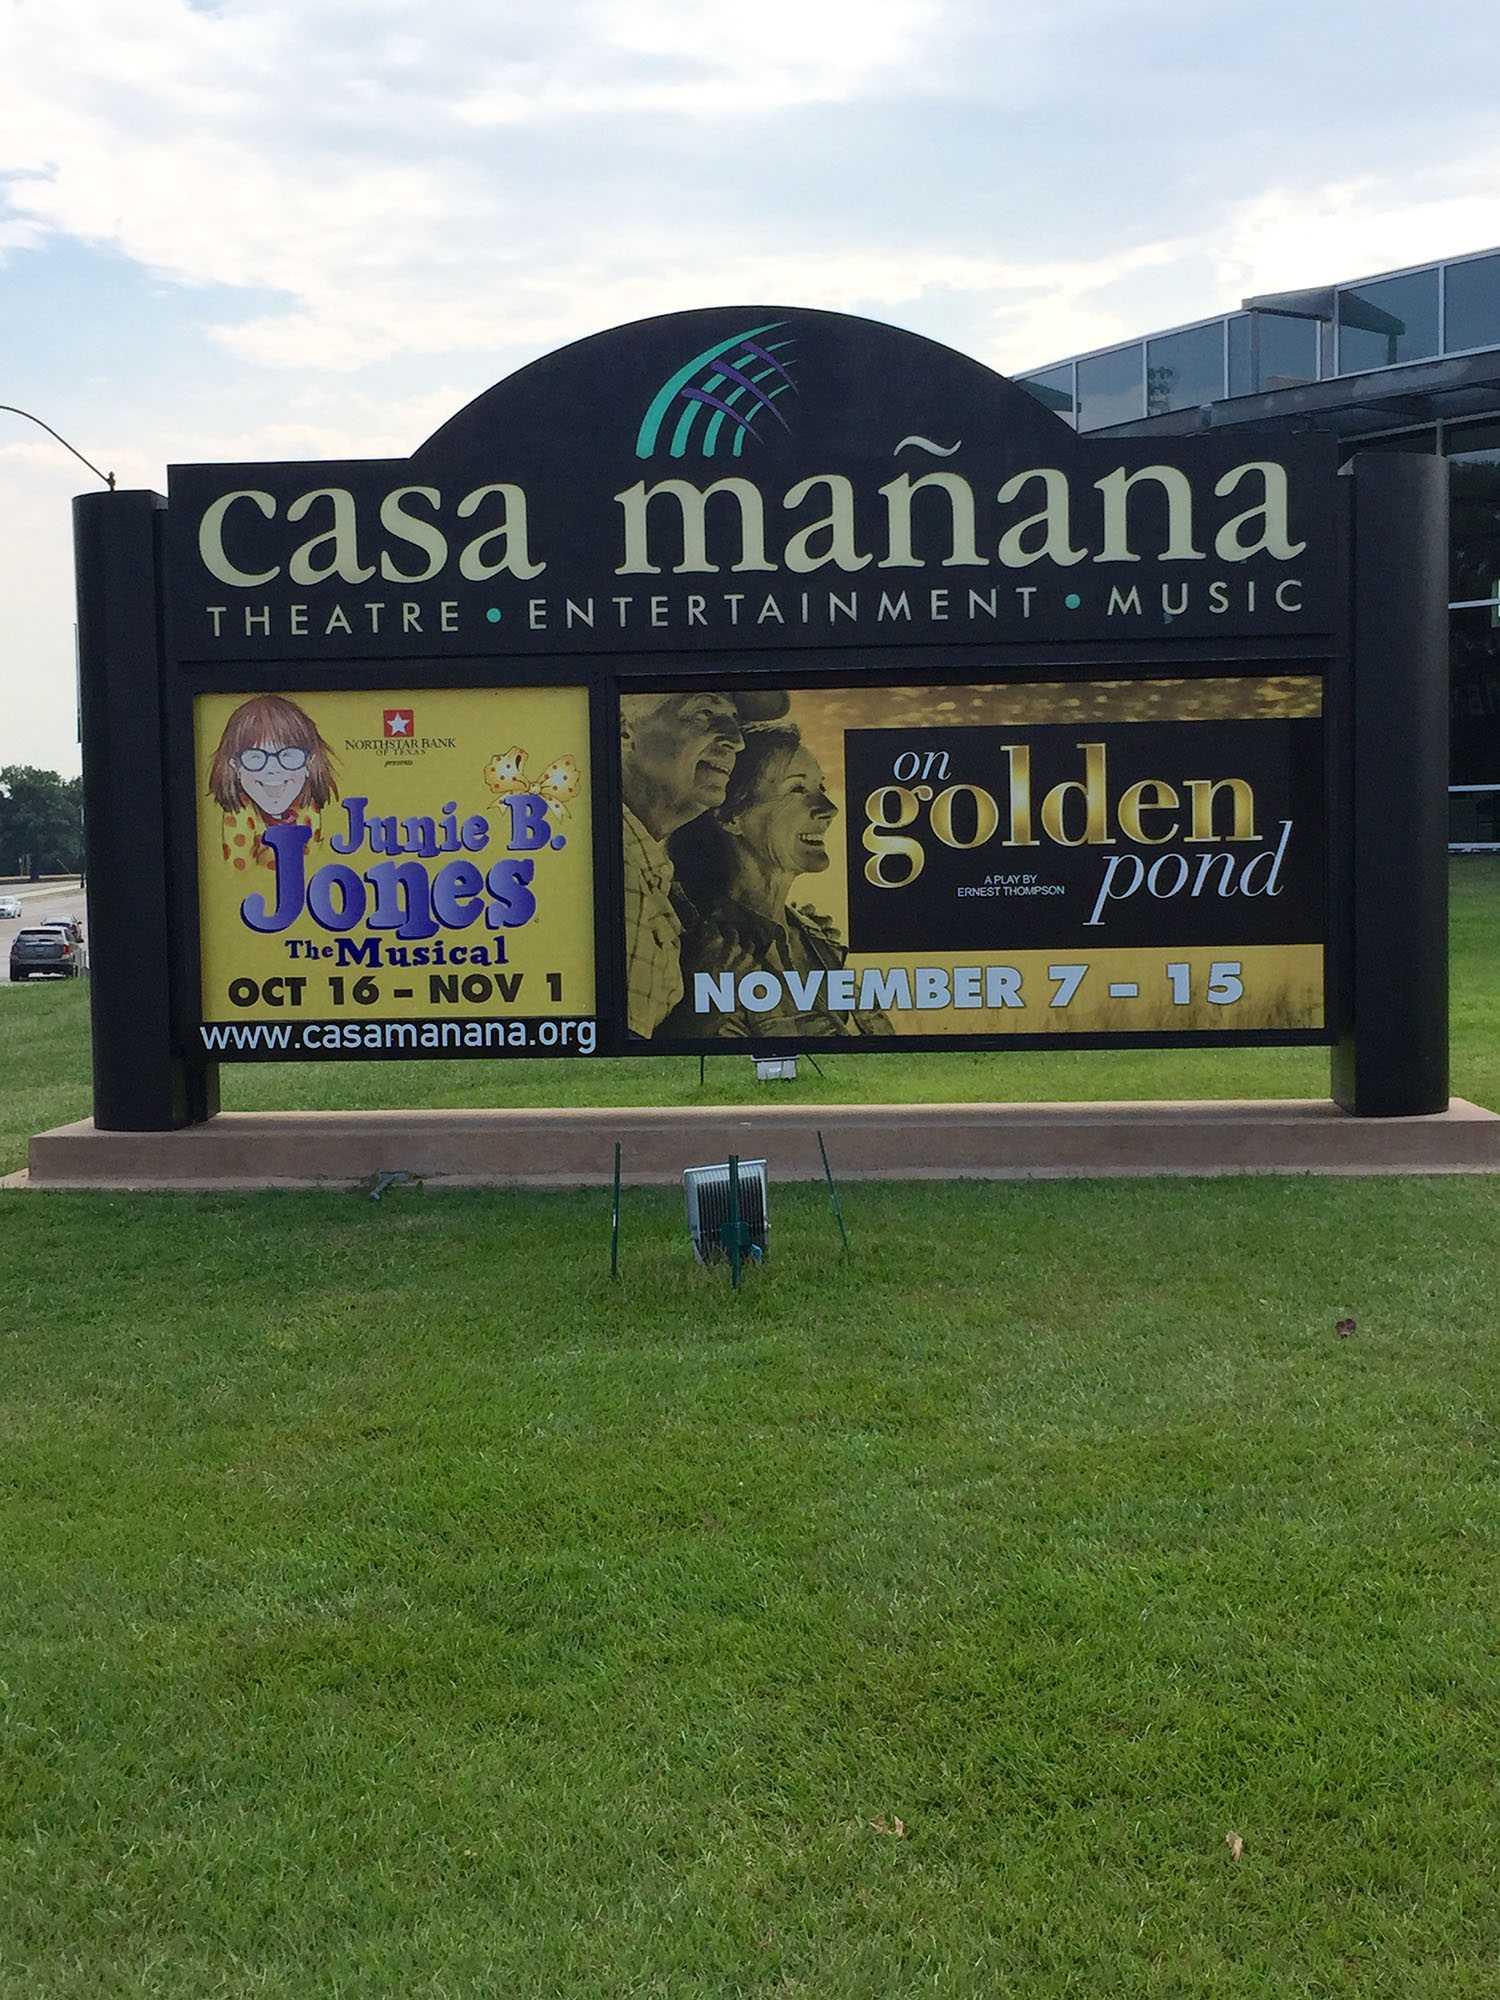 Casa Manana advertises for it's current show, Junie B. Jones.